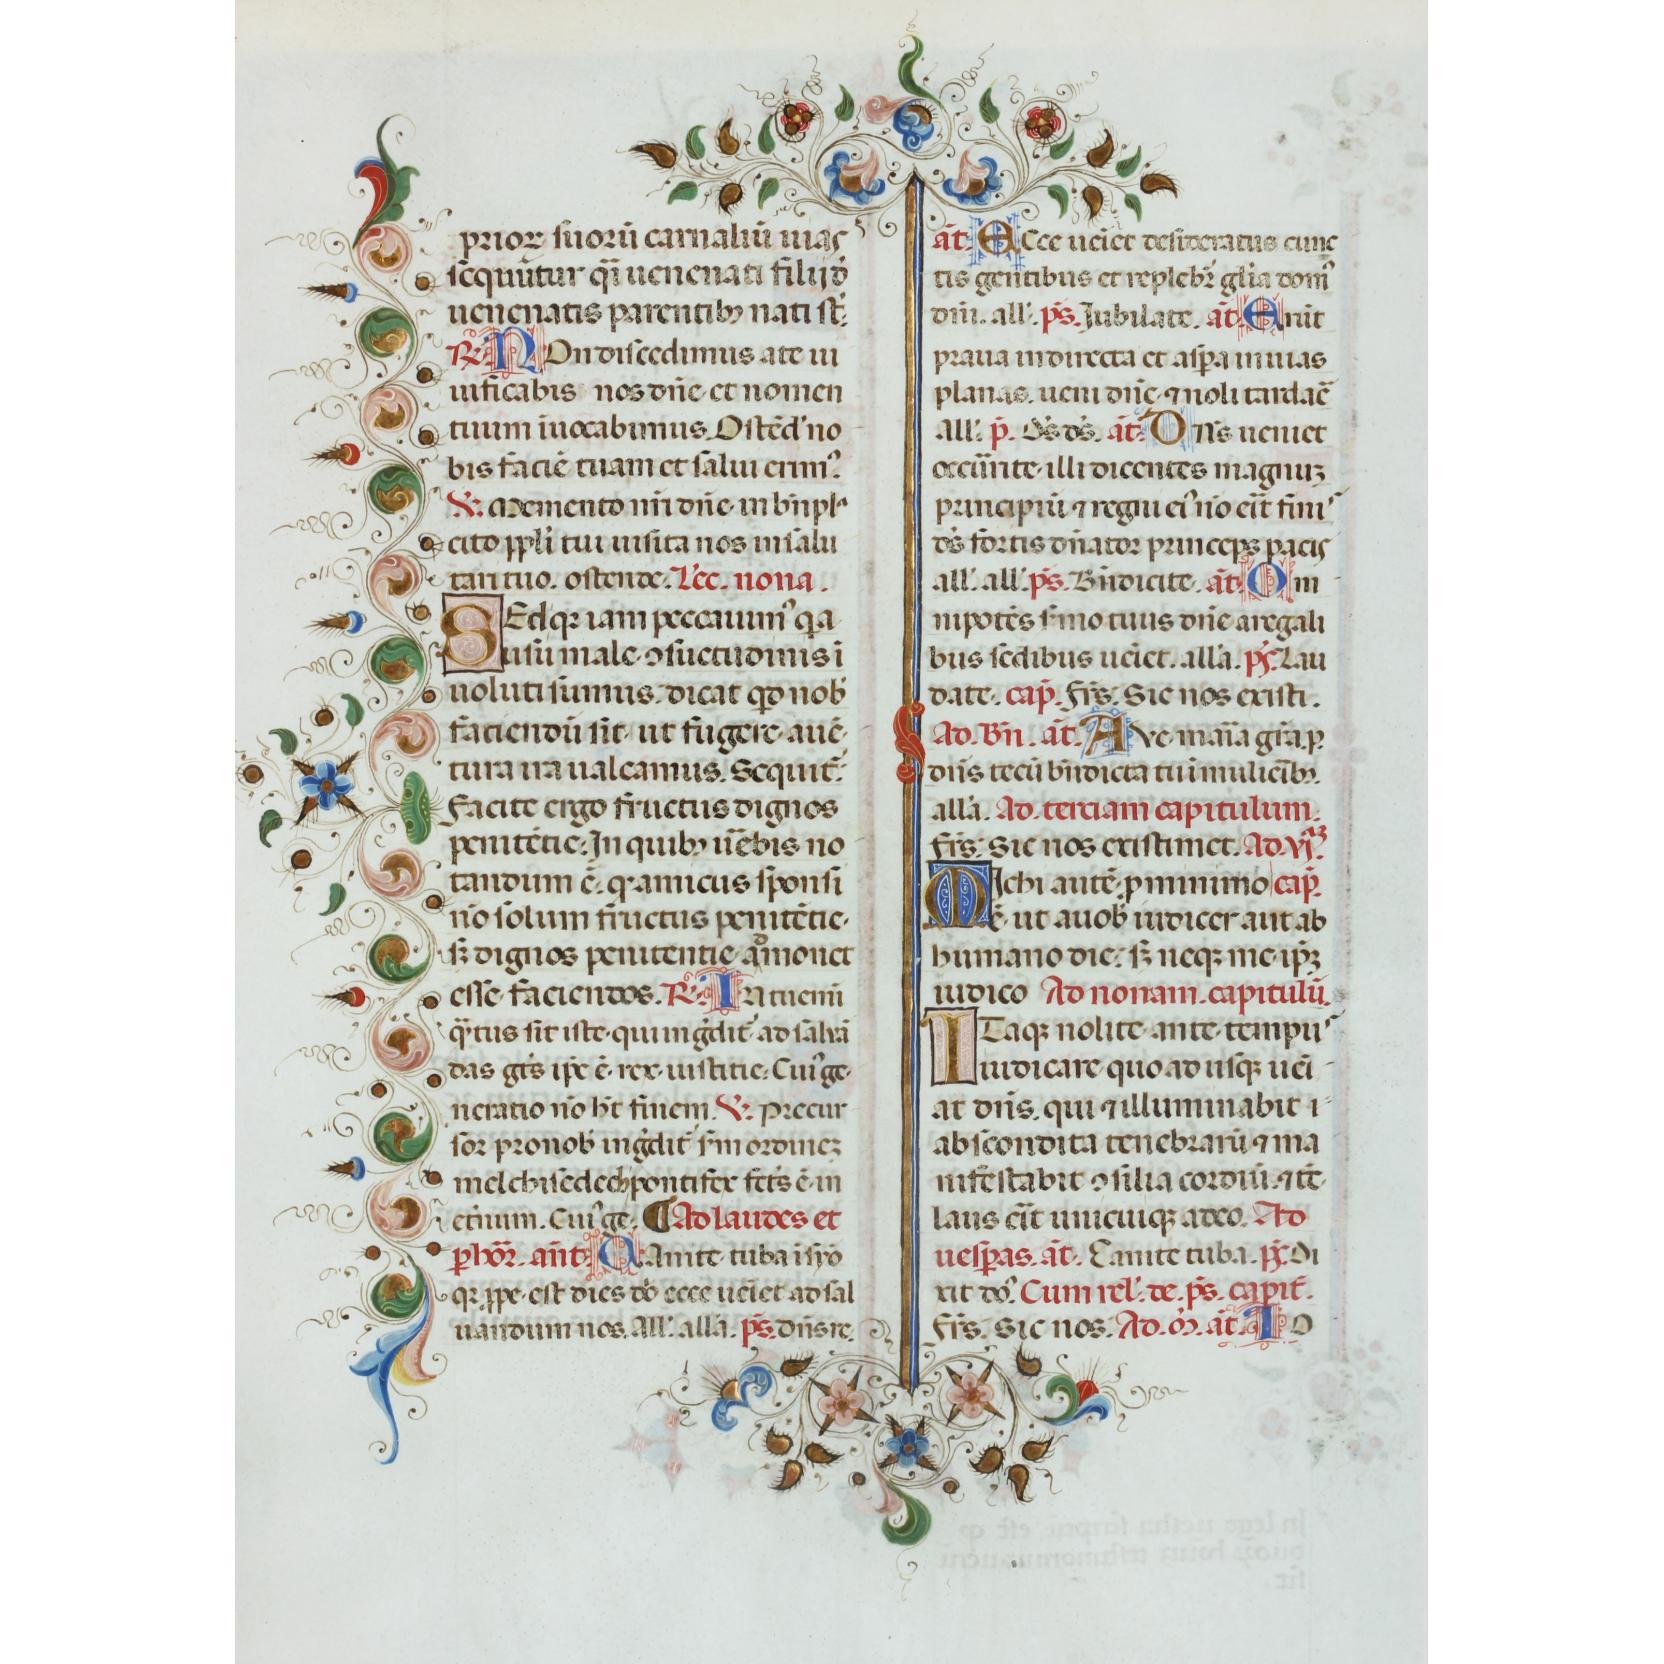 northern-italian-illuminated-manuscript-page